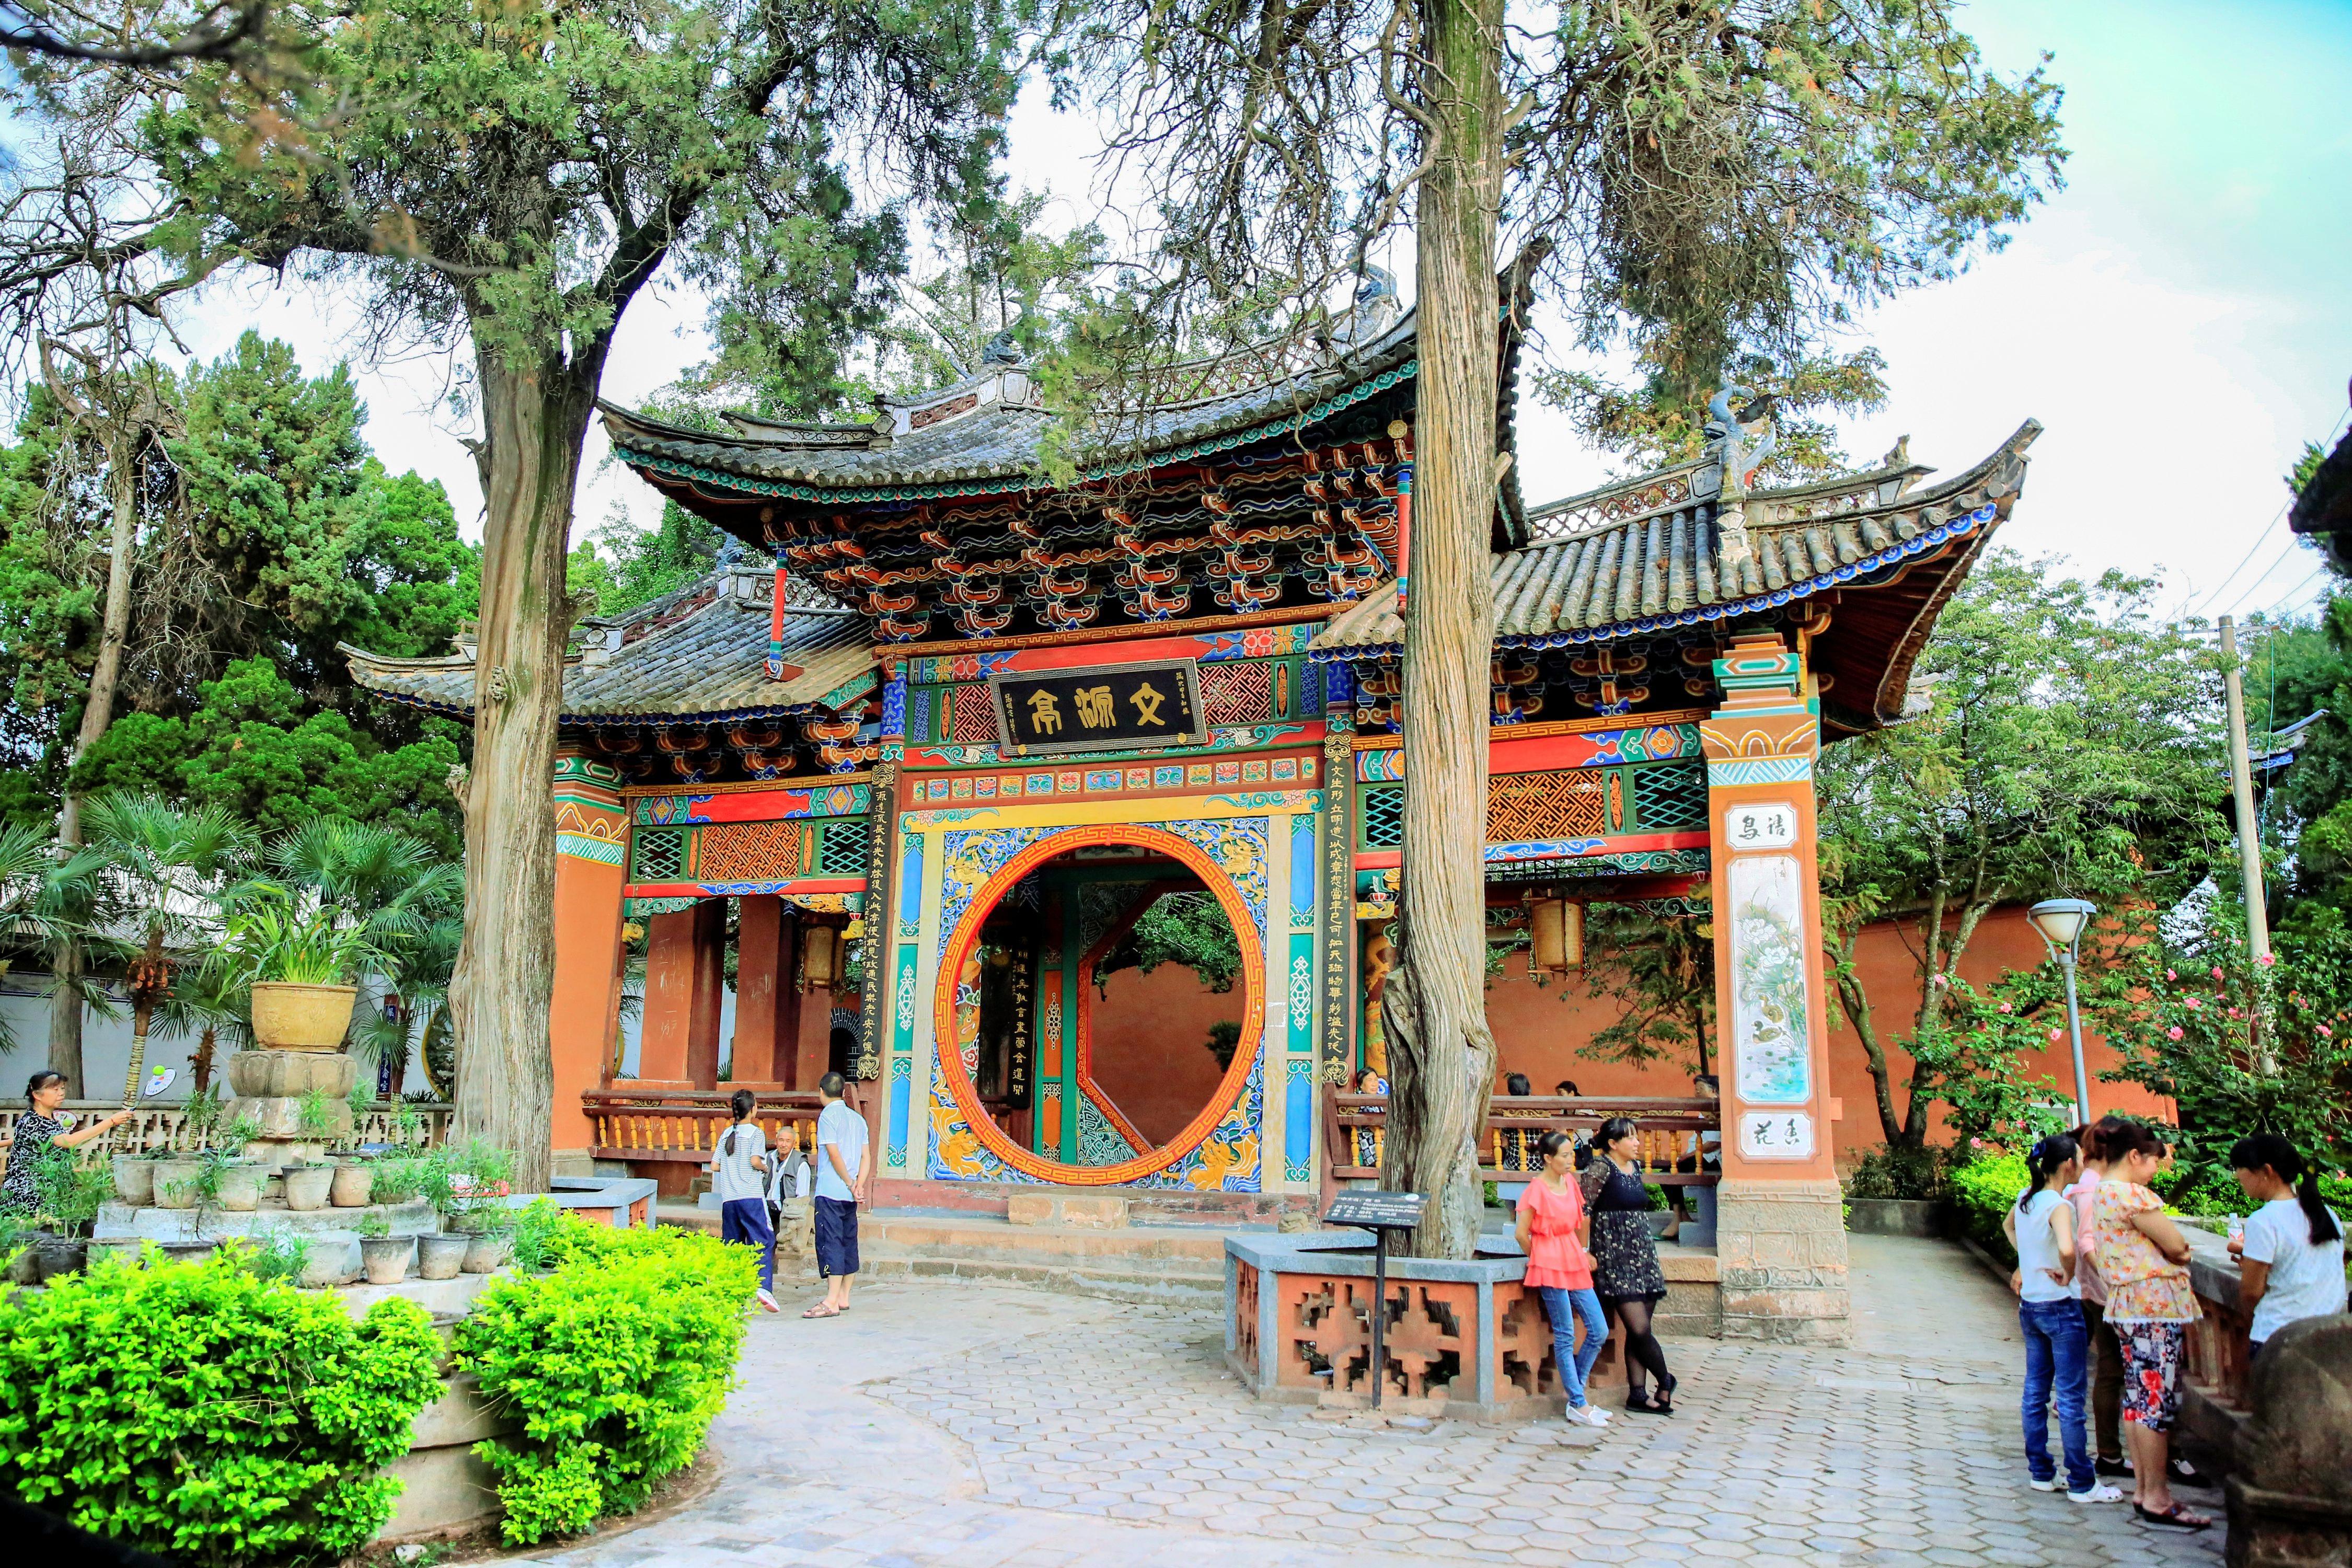 Weishan Ancient City